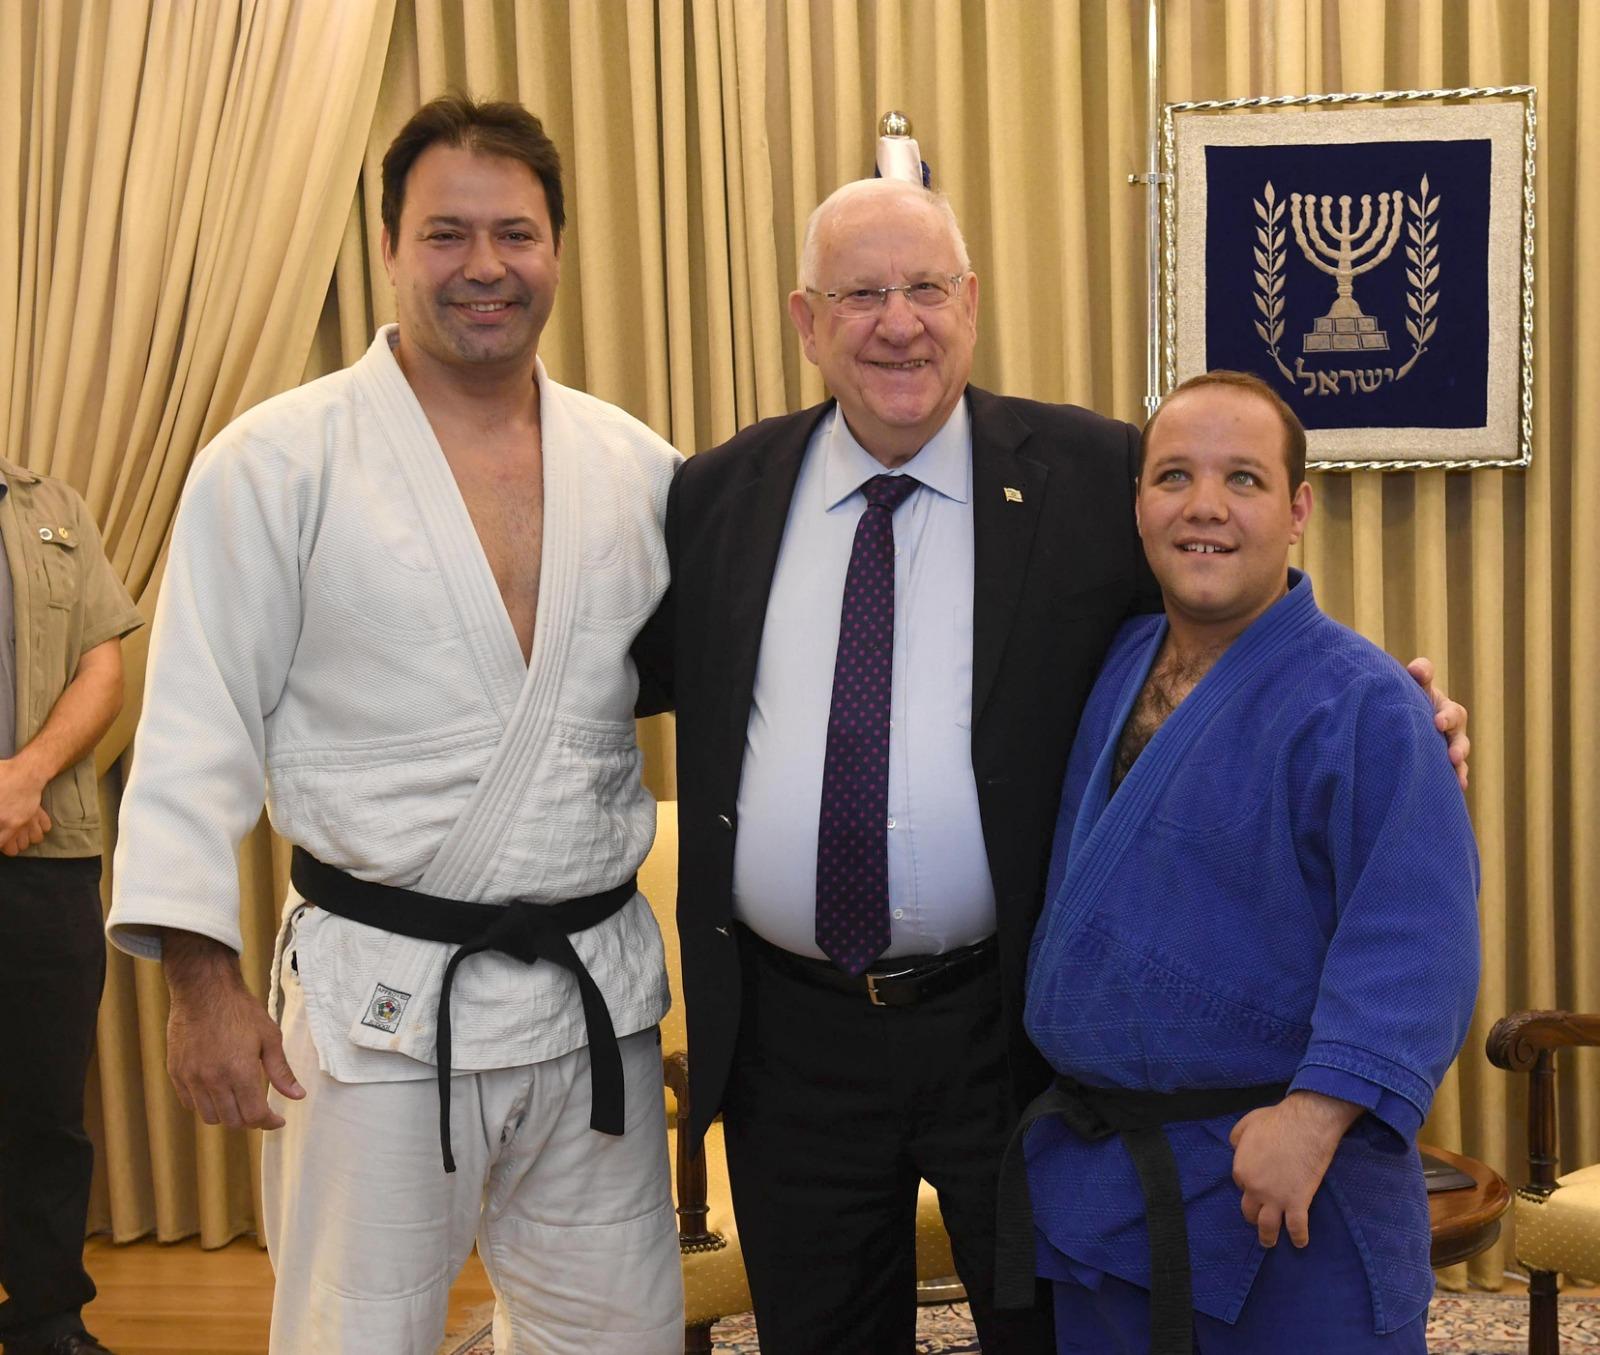 President-Rivlin-with-Arik-Zeevi-and-Special-Olympian-Levav-Barkan-22-November-2018